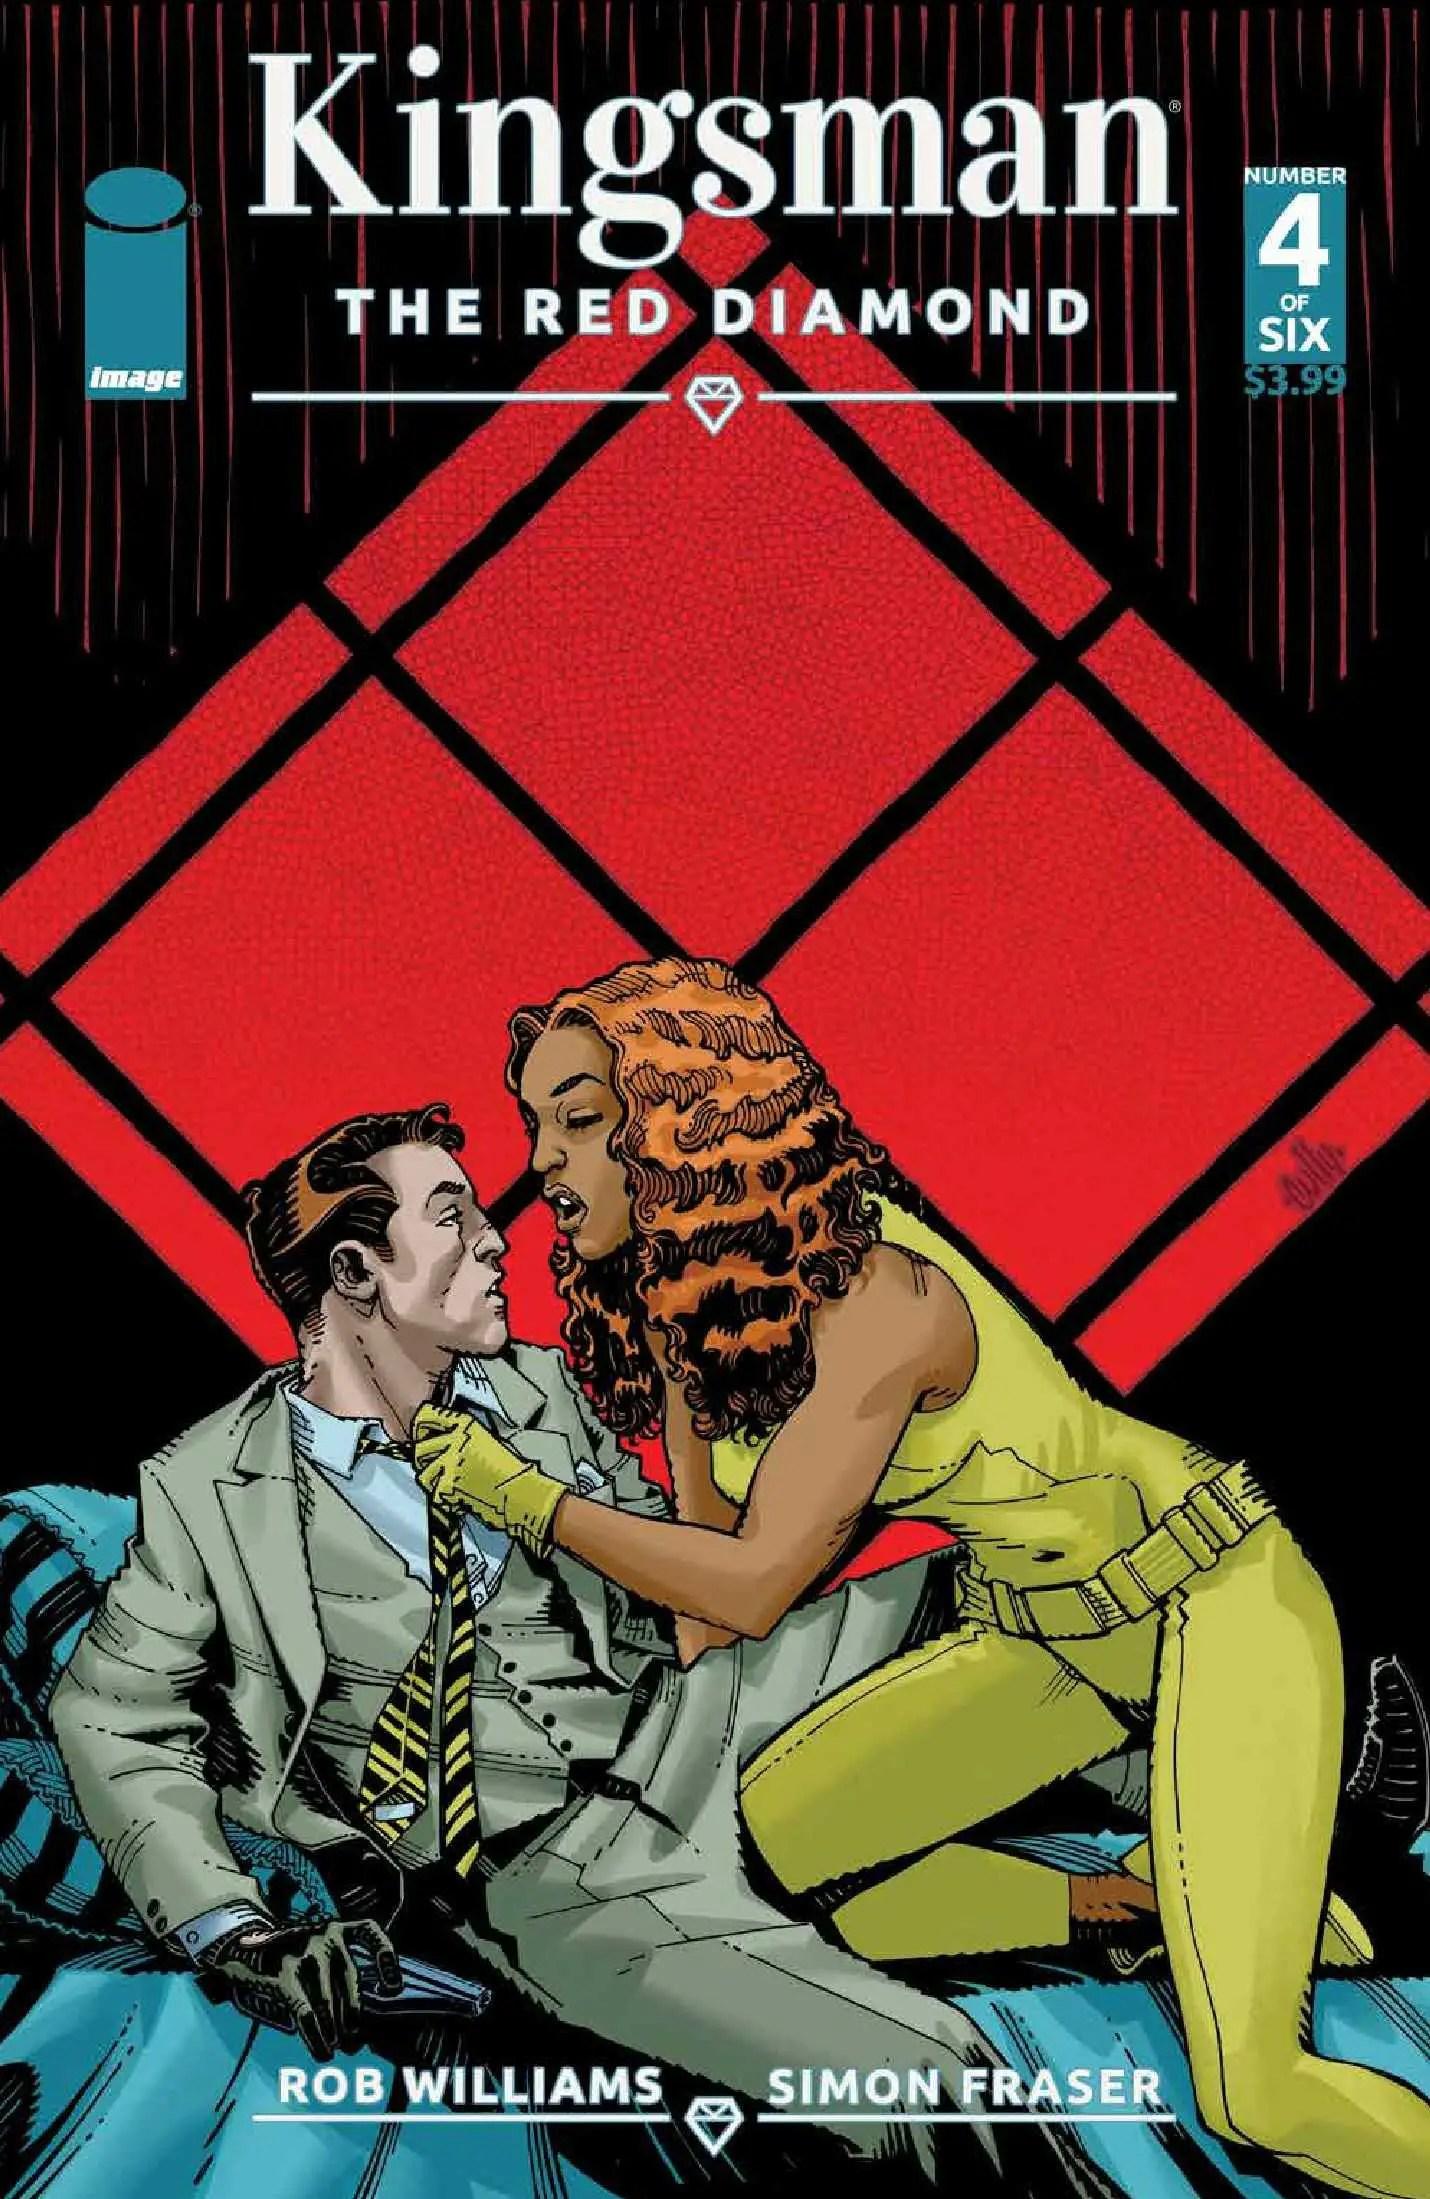 Kingsman: The Red Diamond #4 Review